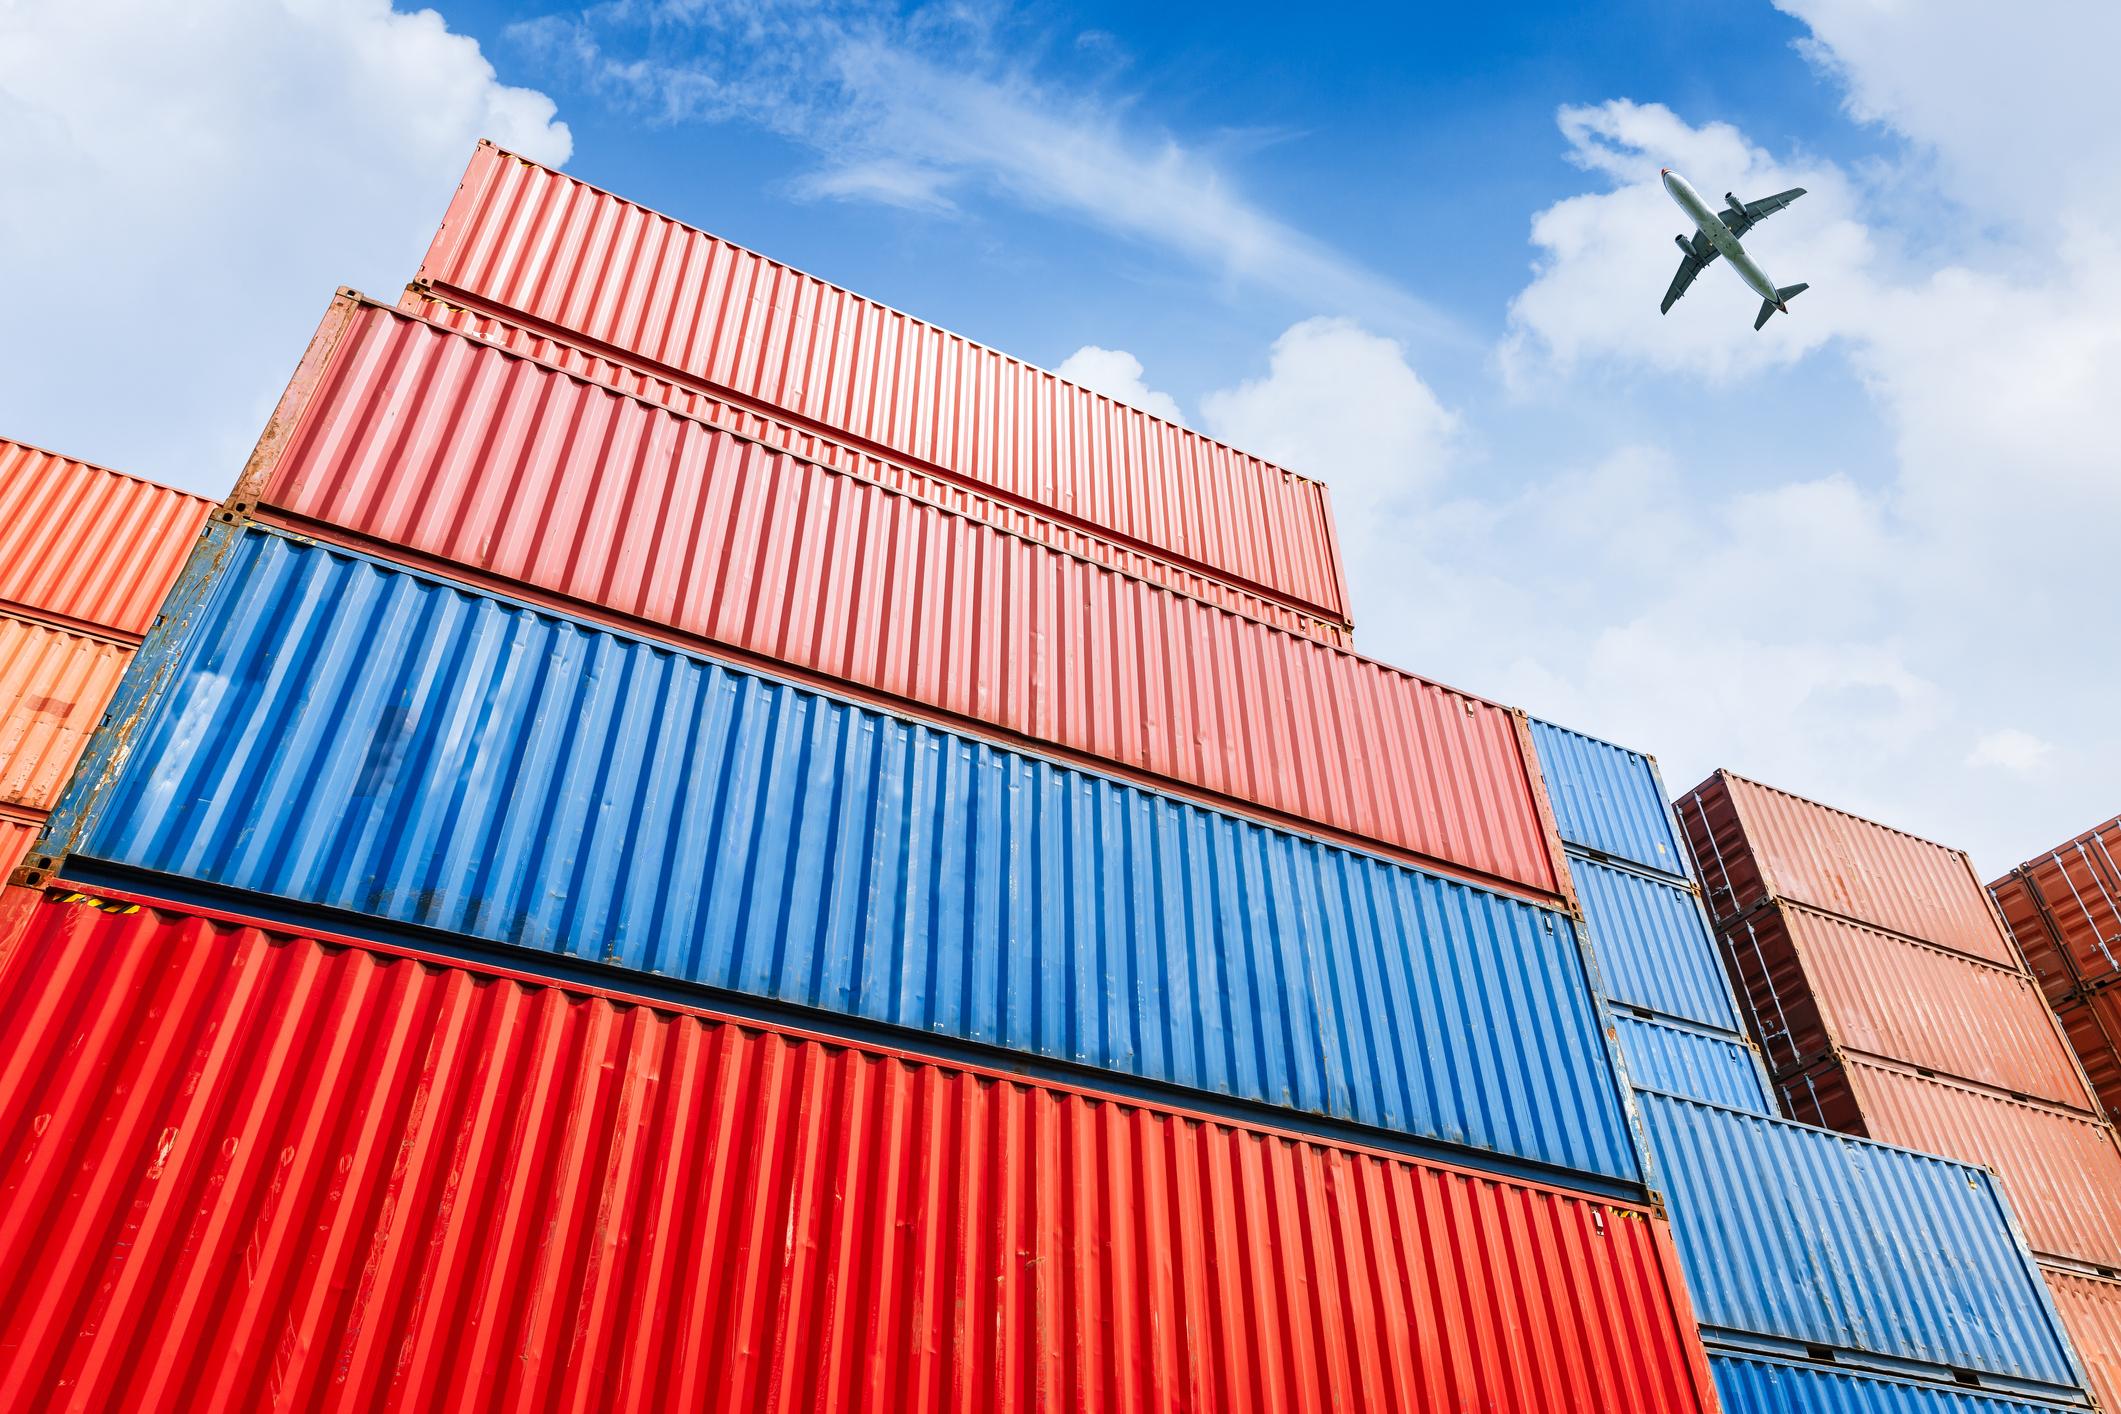 Externalizar Compras en China